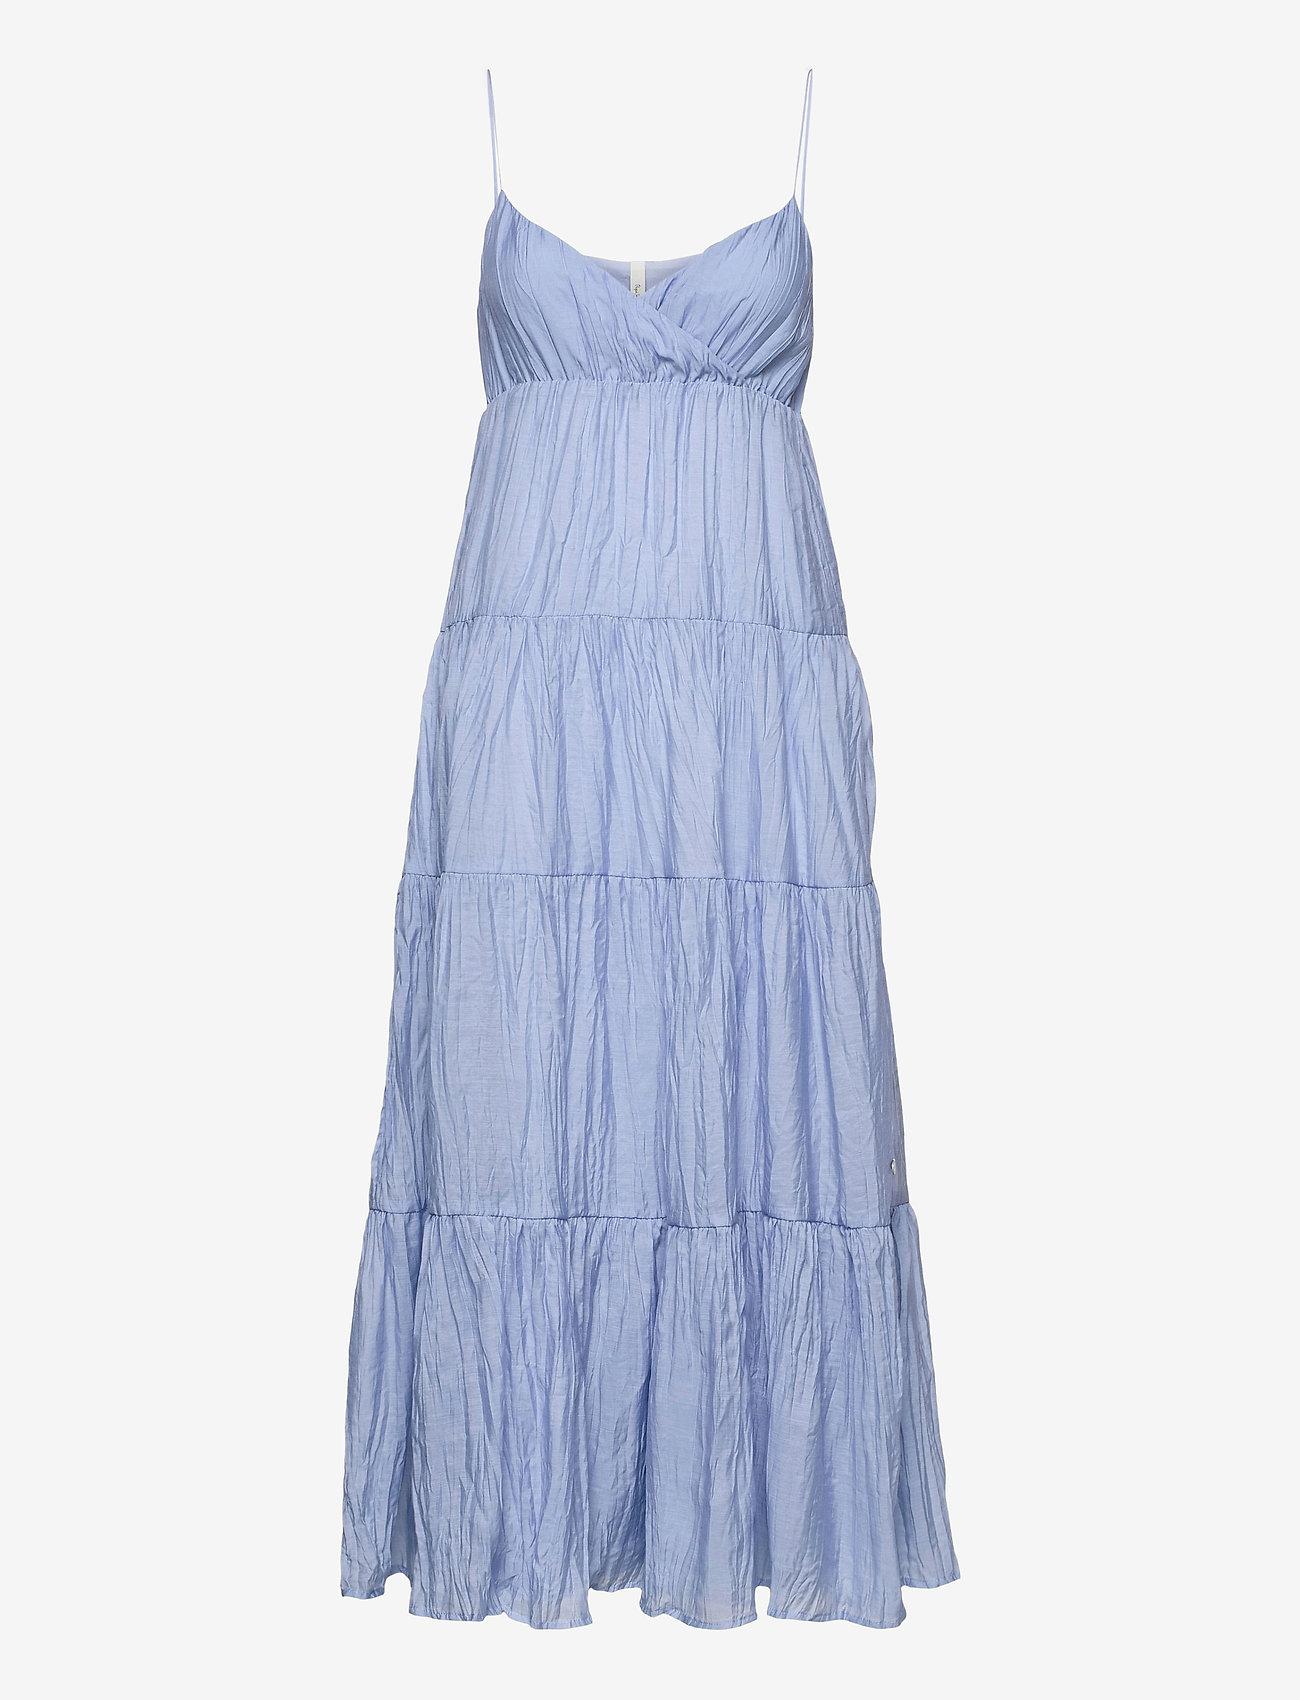 Pepe Jeans London - ANAE - maxi dresses - blue - 0